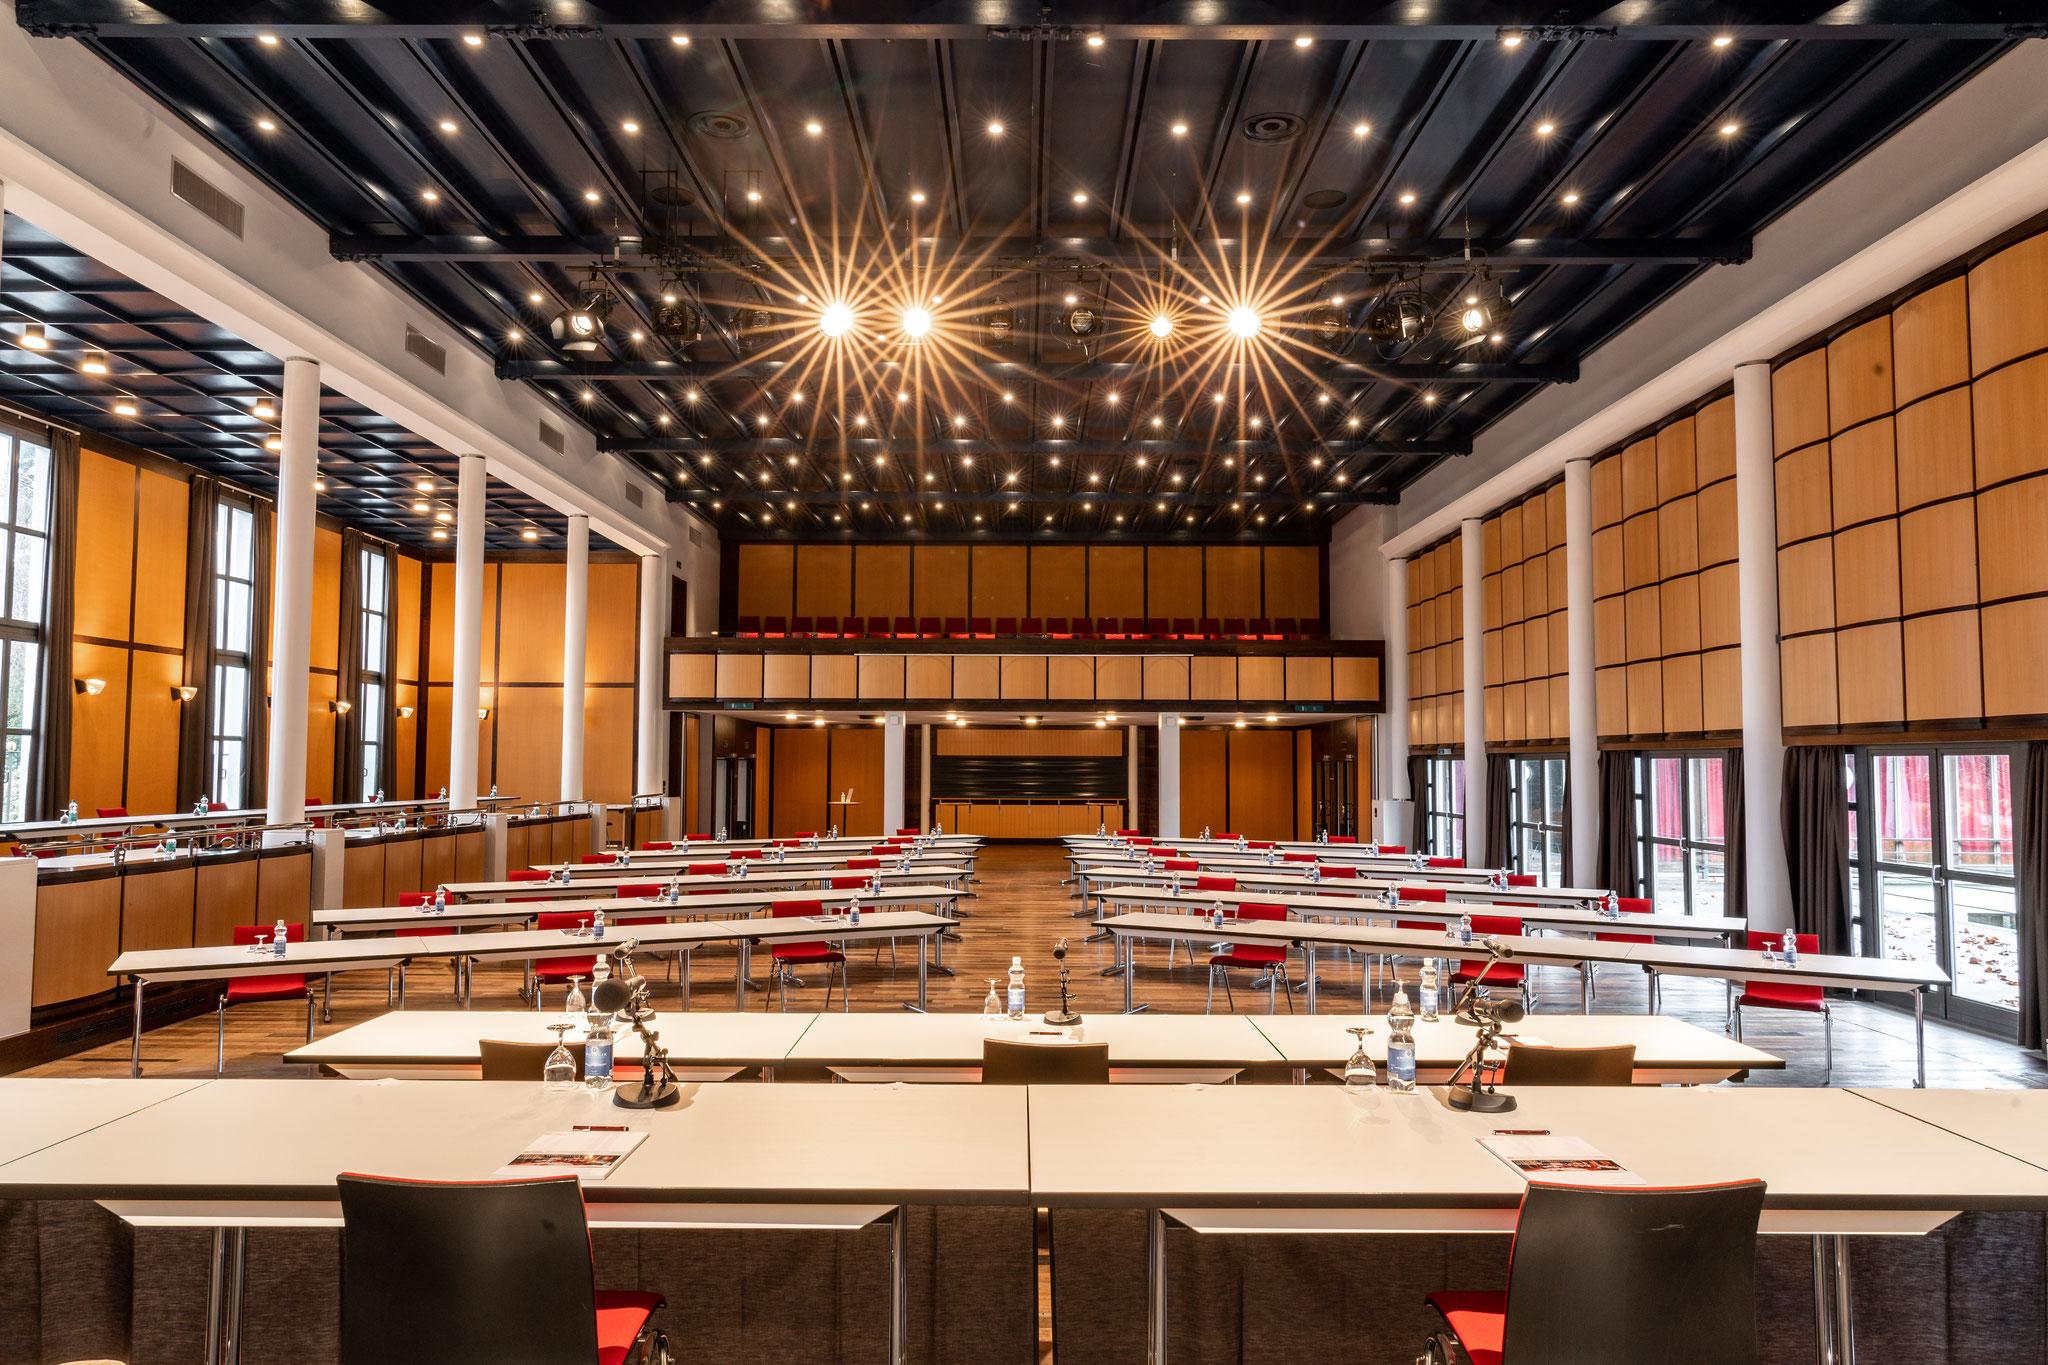 Impressionen / Bilder   Stadtsaal Zofingen – Vielfältig elegant